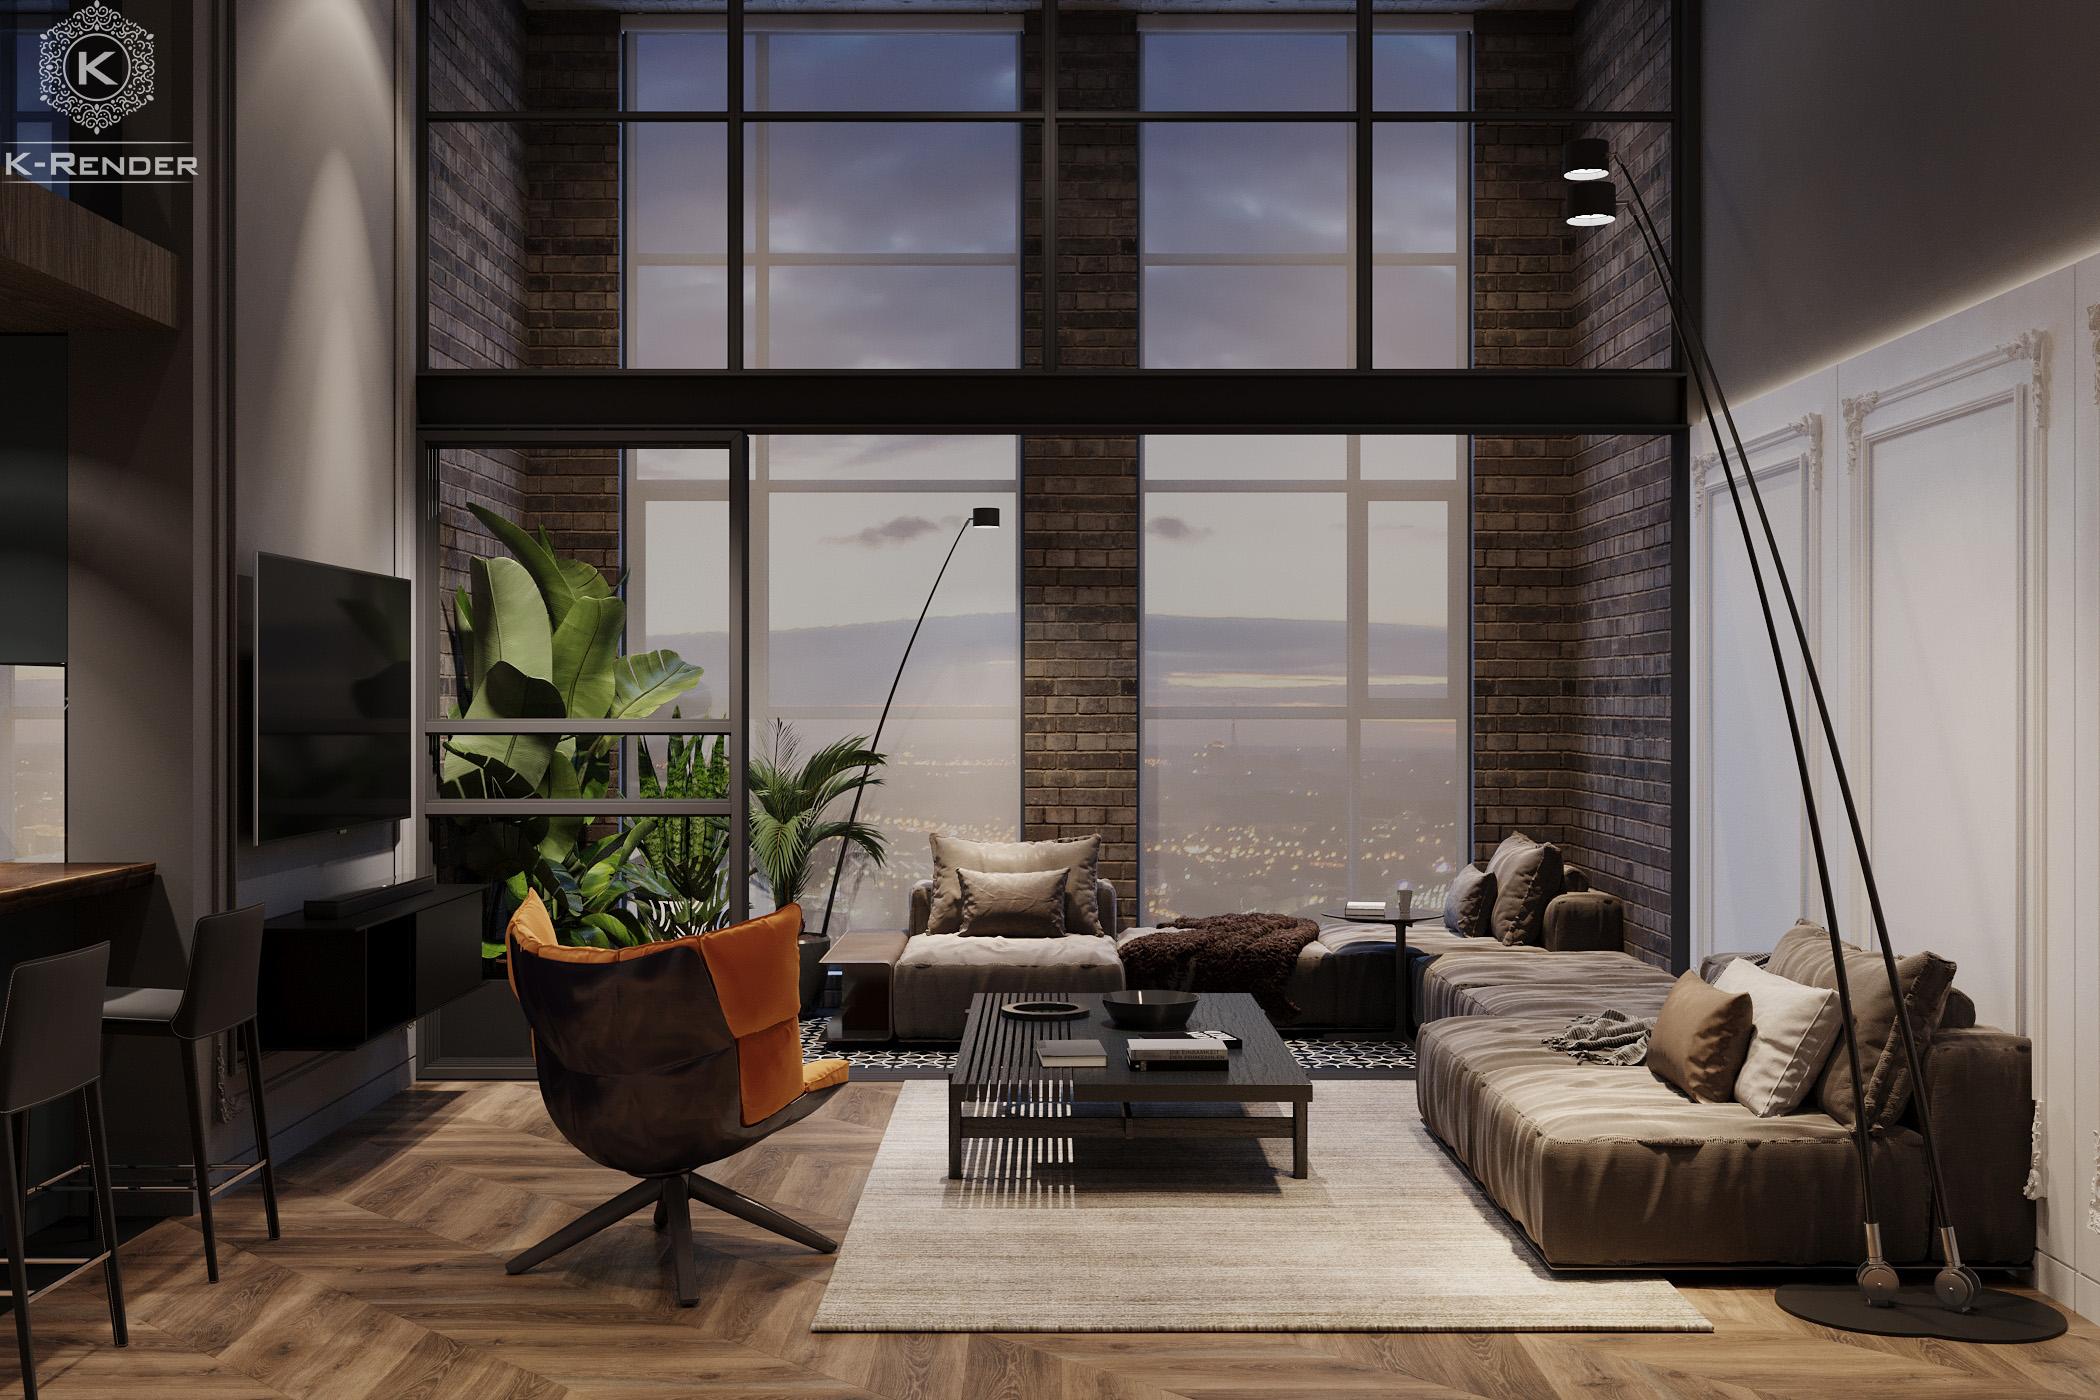 sunshine-apartment-k-render-studio-3d-rendering-studio-5